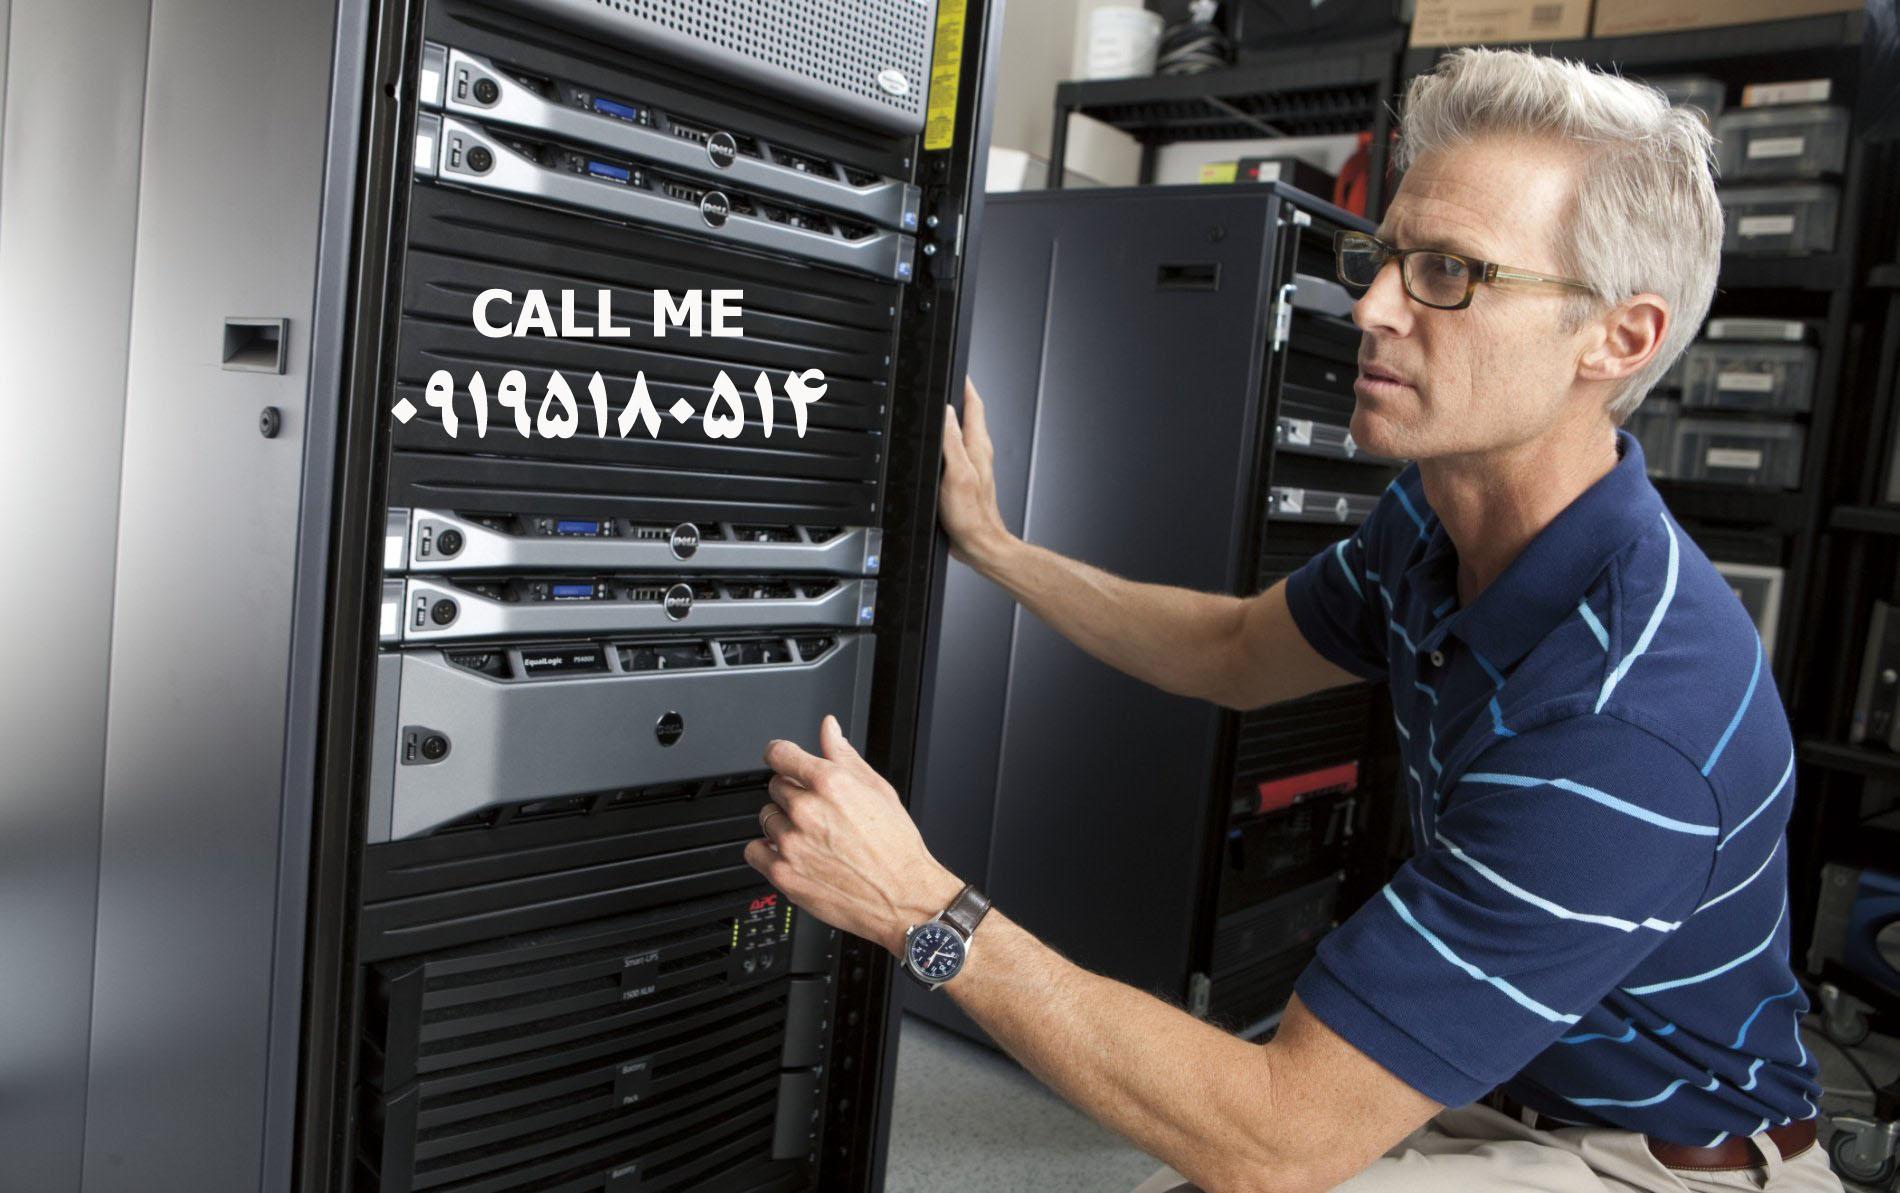 HP IRAN - نمايندگي, اچپي,  dl380g9, server, hp, سرور,